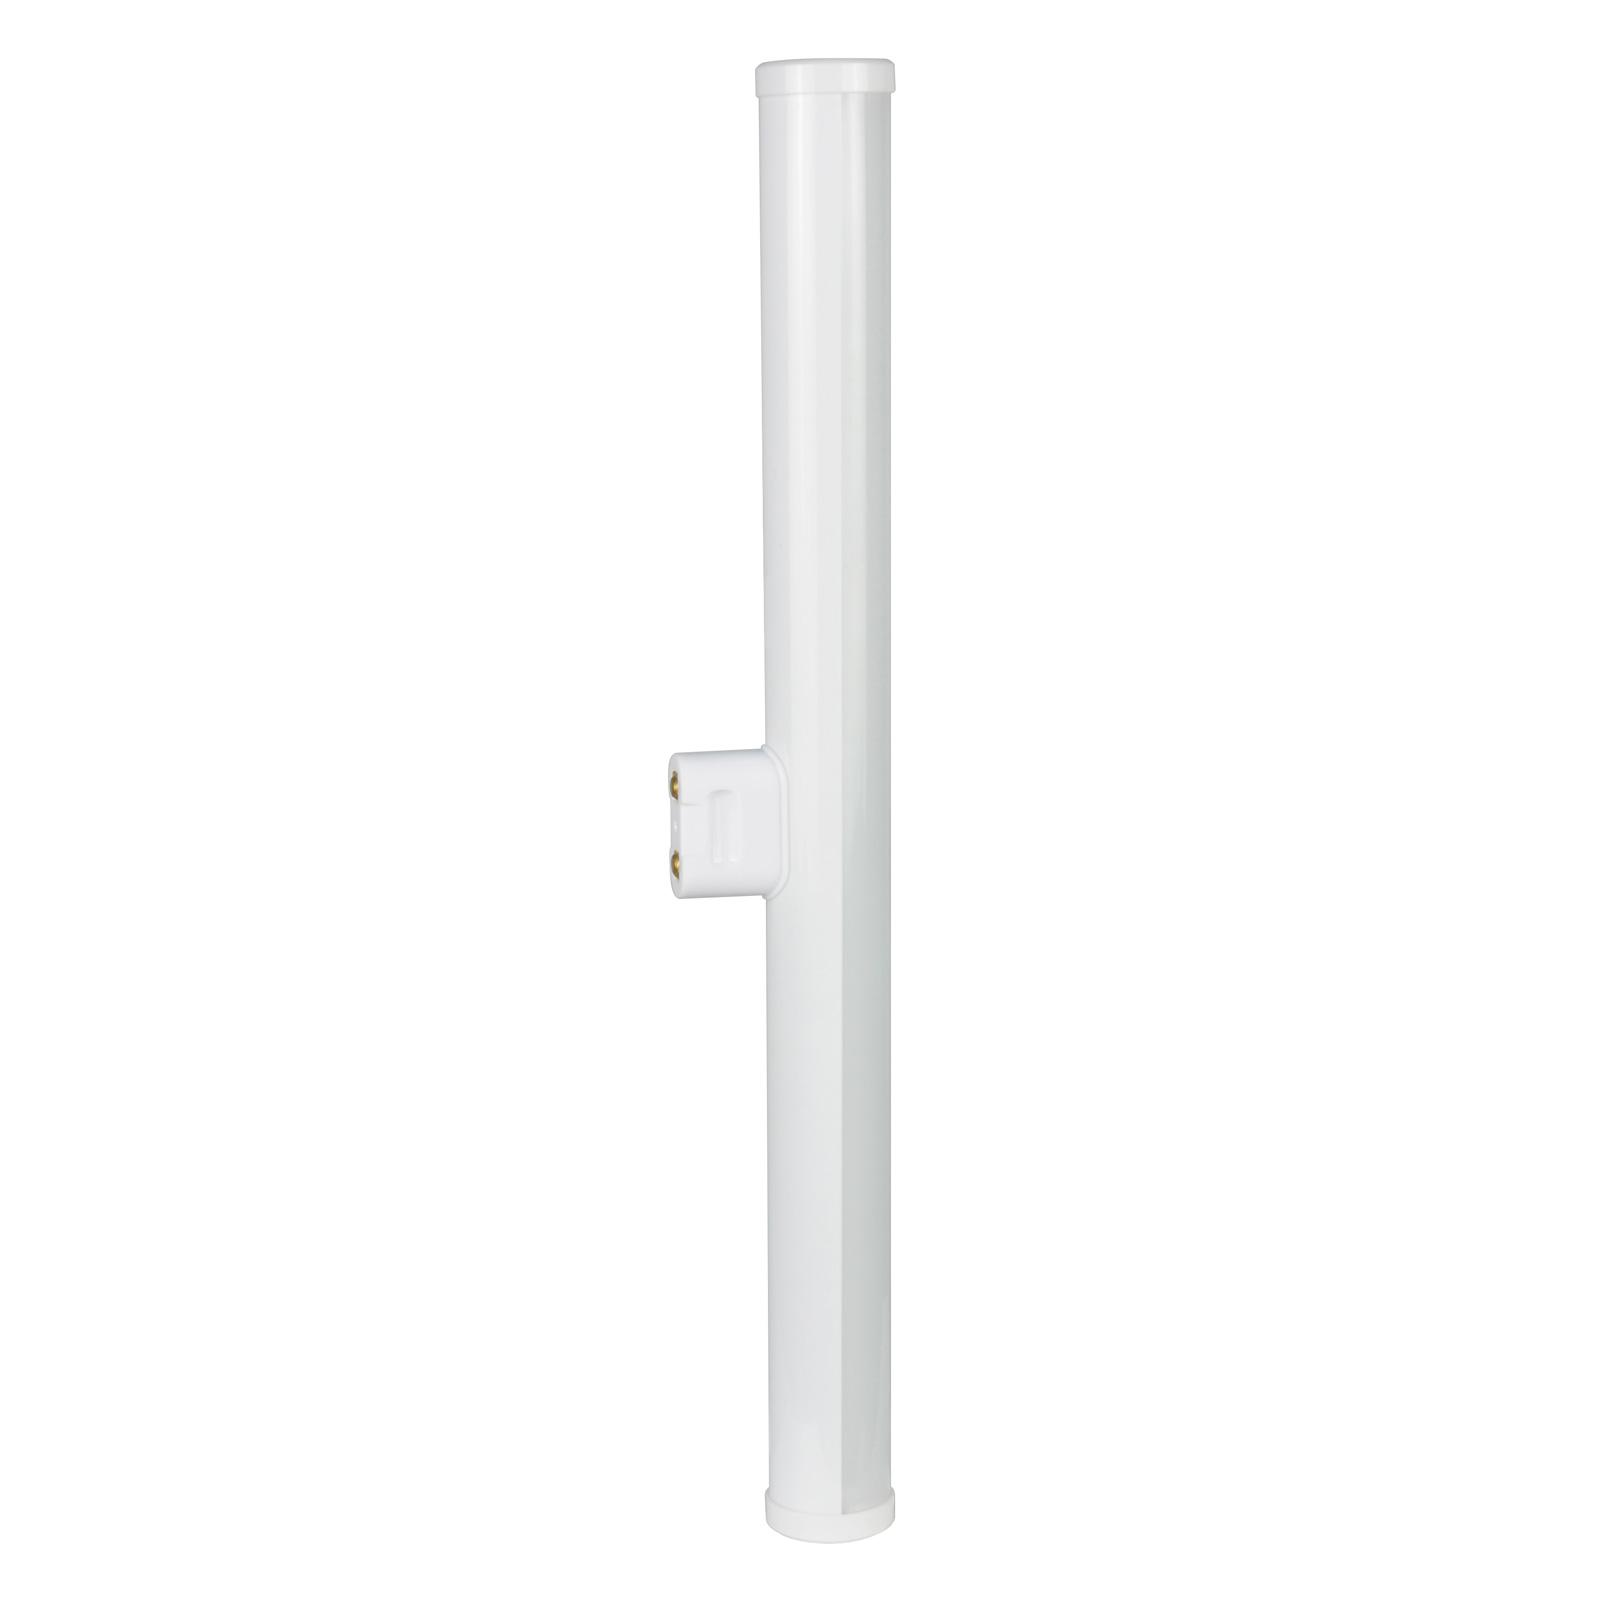 LED-Linienlampe S14d, 5W 827  1-Sockel 500mm